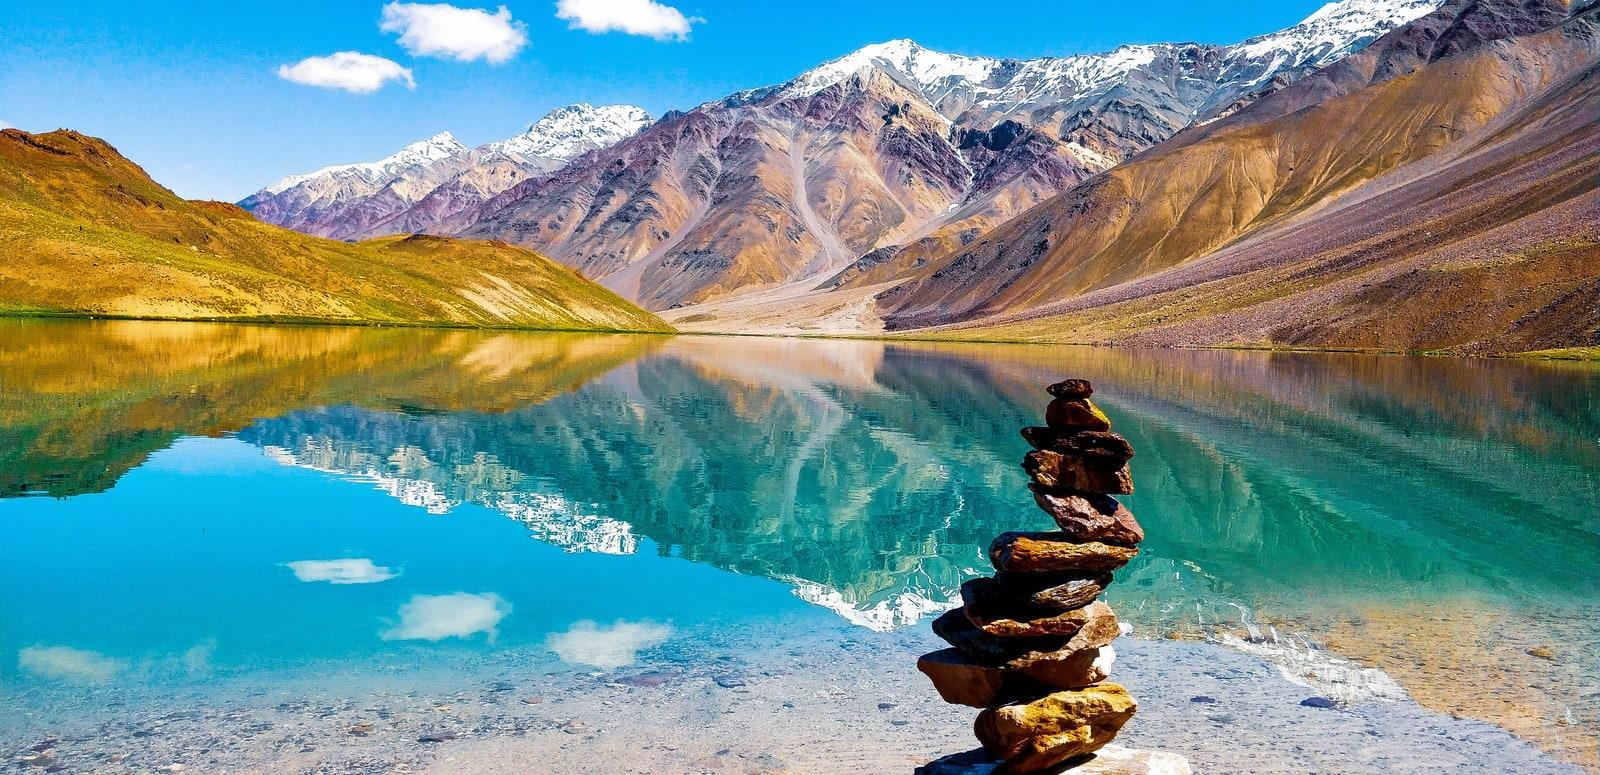 Image result for 9. Komik spiti valley images